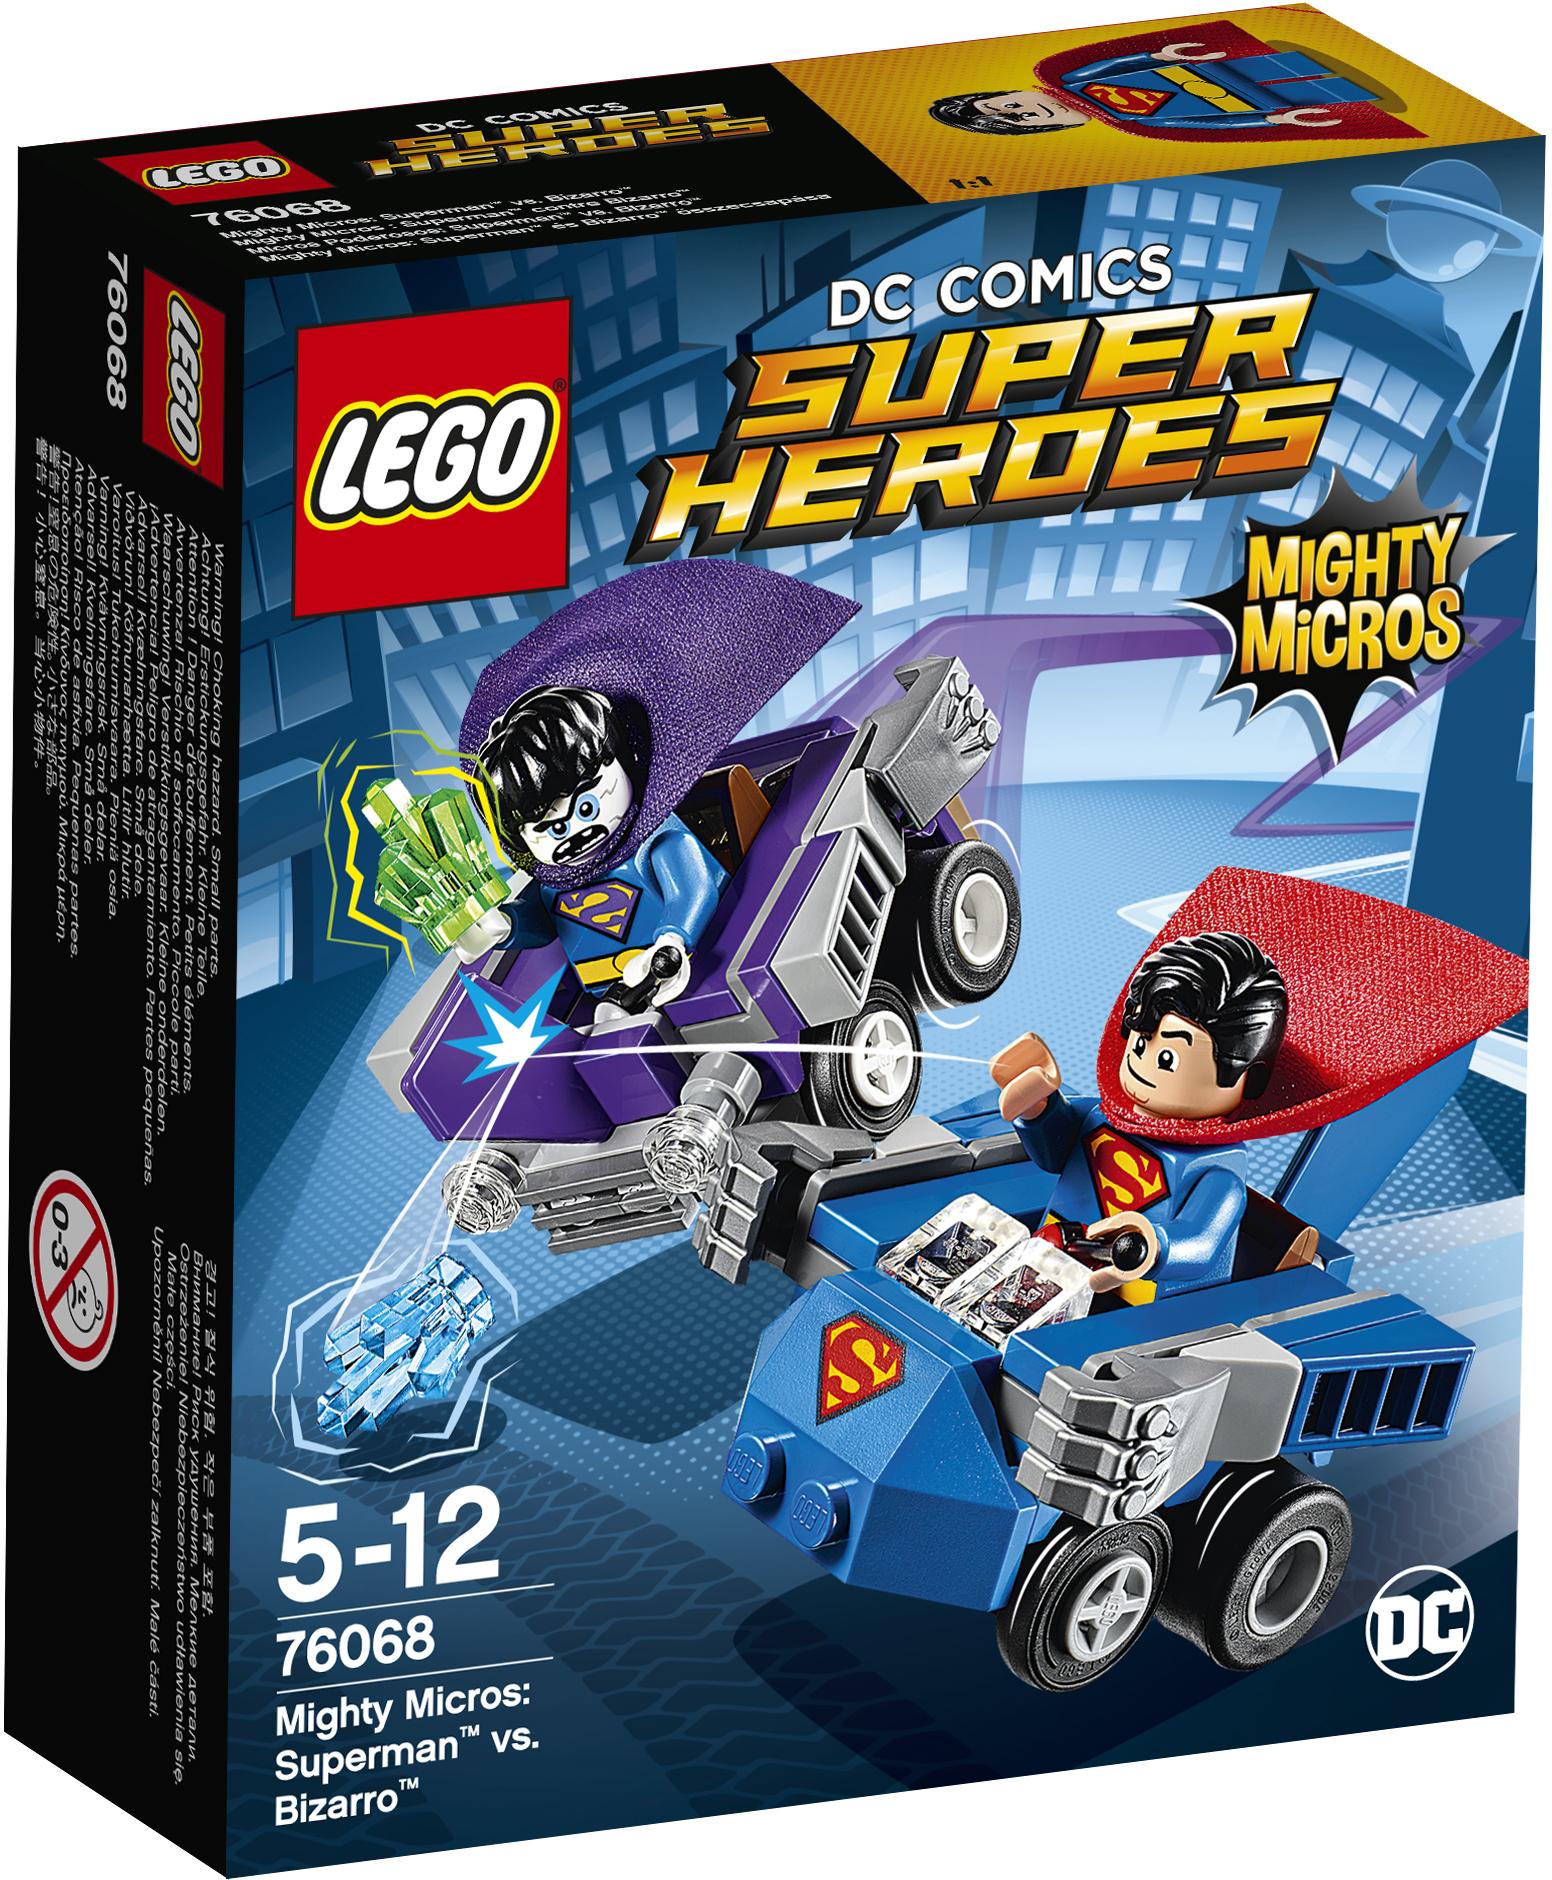 LEGO Super Heroes 76068 - Супермен против Бизарро конструктор lego super heroes супермен против бизарро 76068